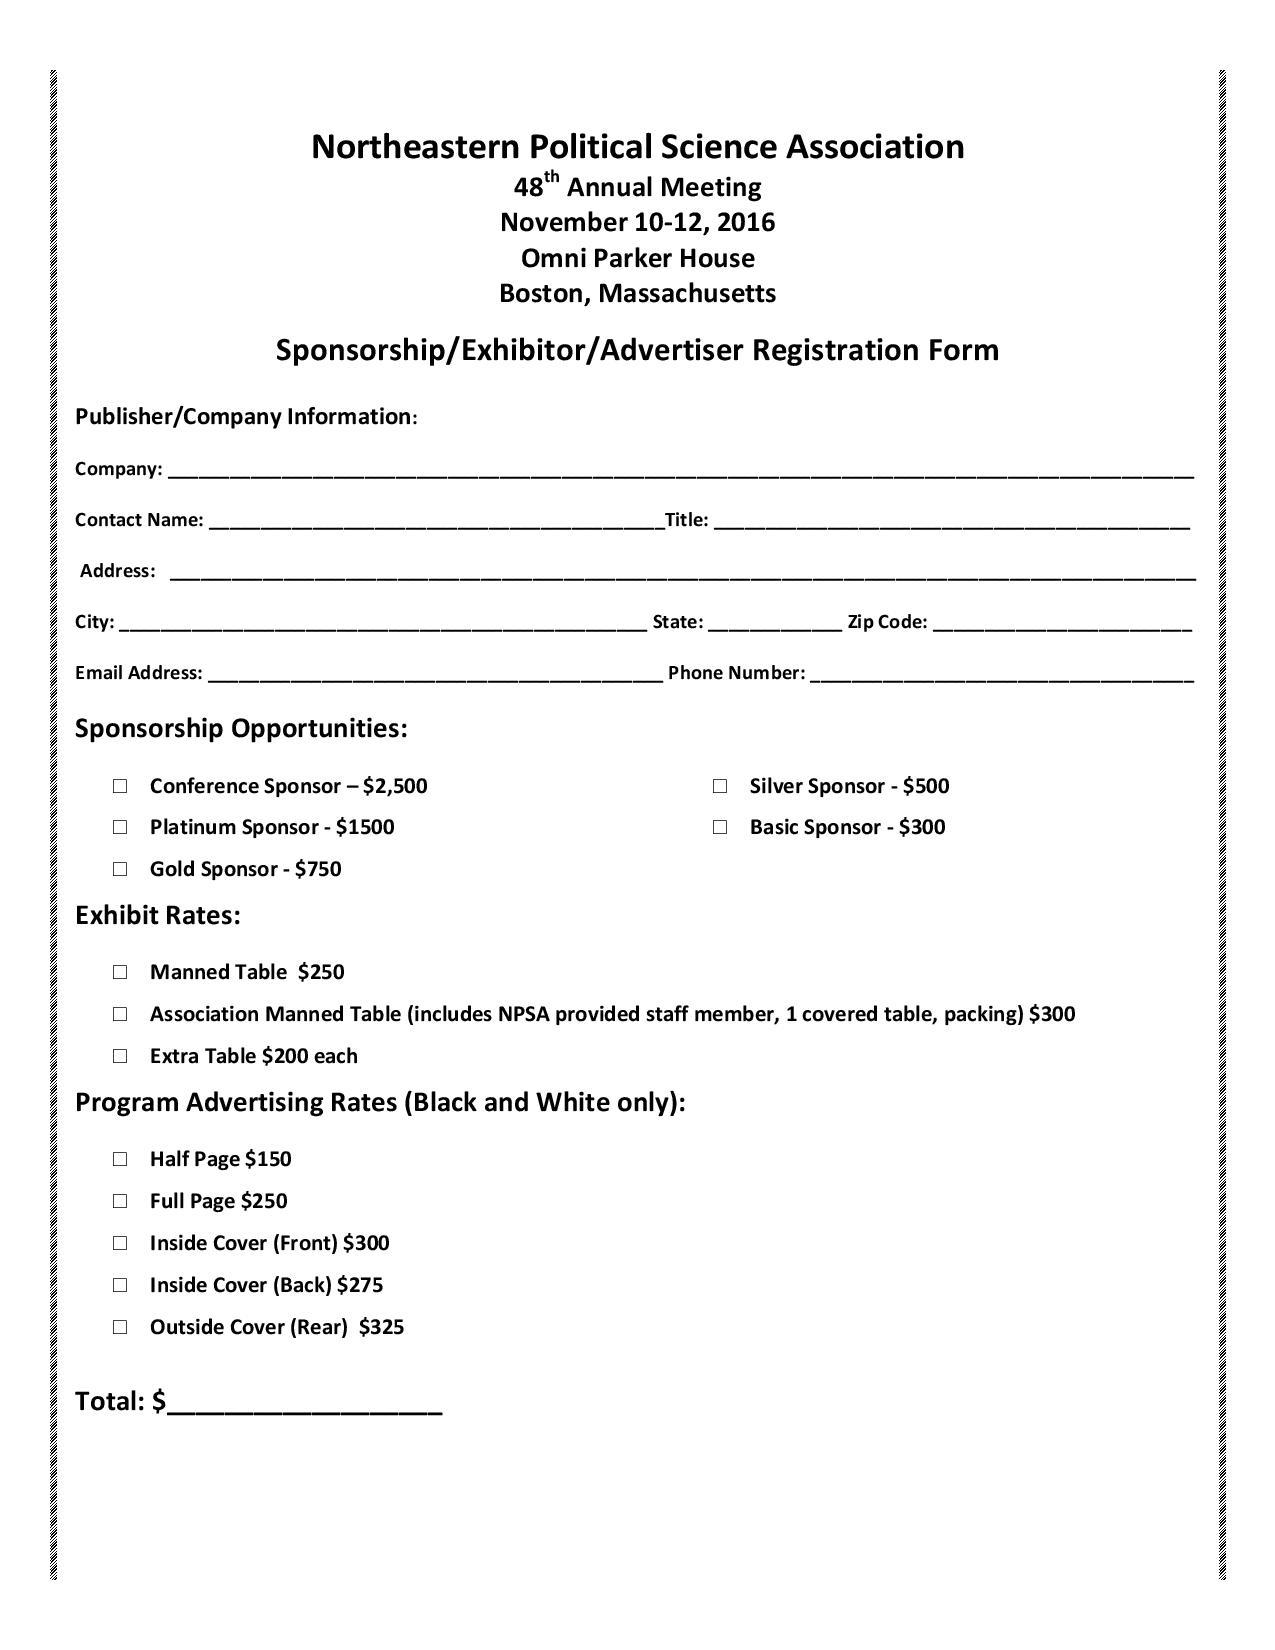 NPSA-Exhibitor-Form-2016-page-001.jpg